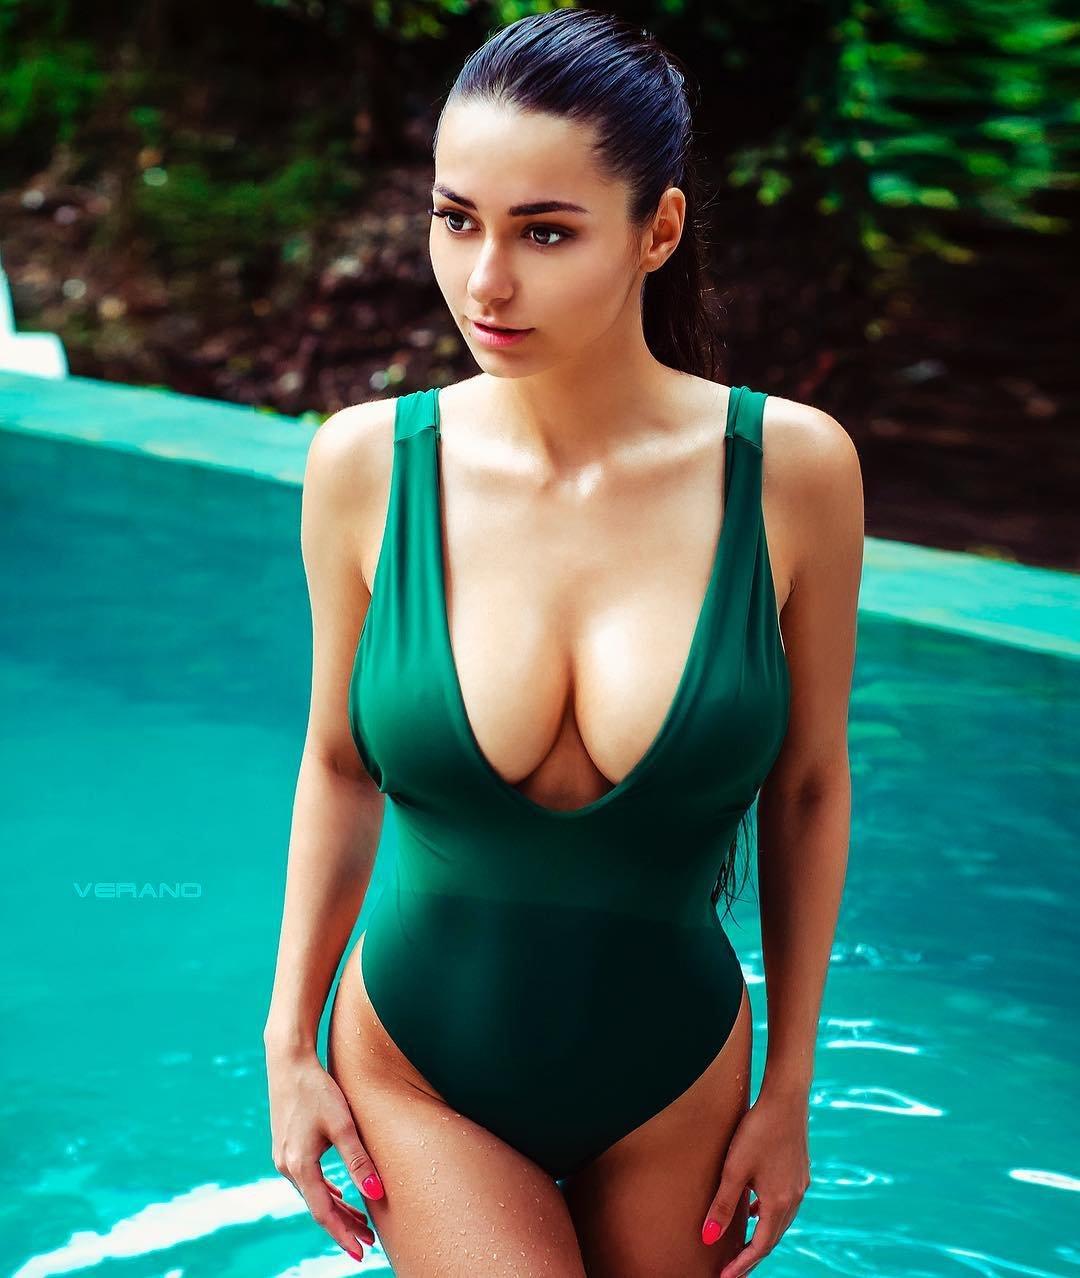 Instagram Helga Lovekaty nudes (28 foto and video), Sexy, Leaked, Boobs, in bikini 2015